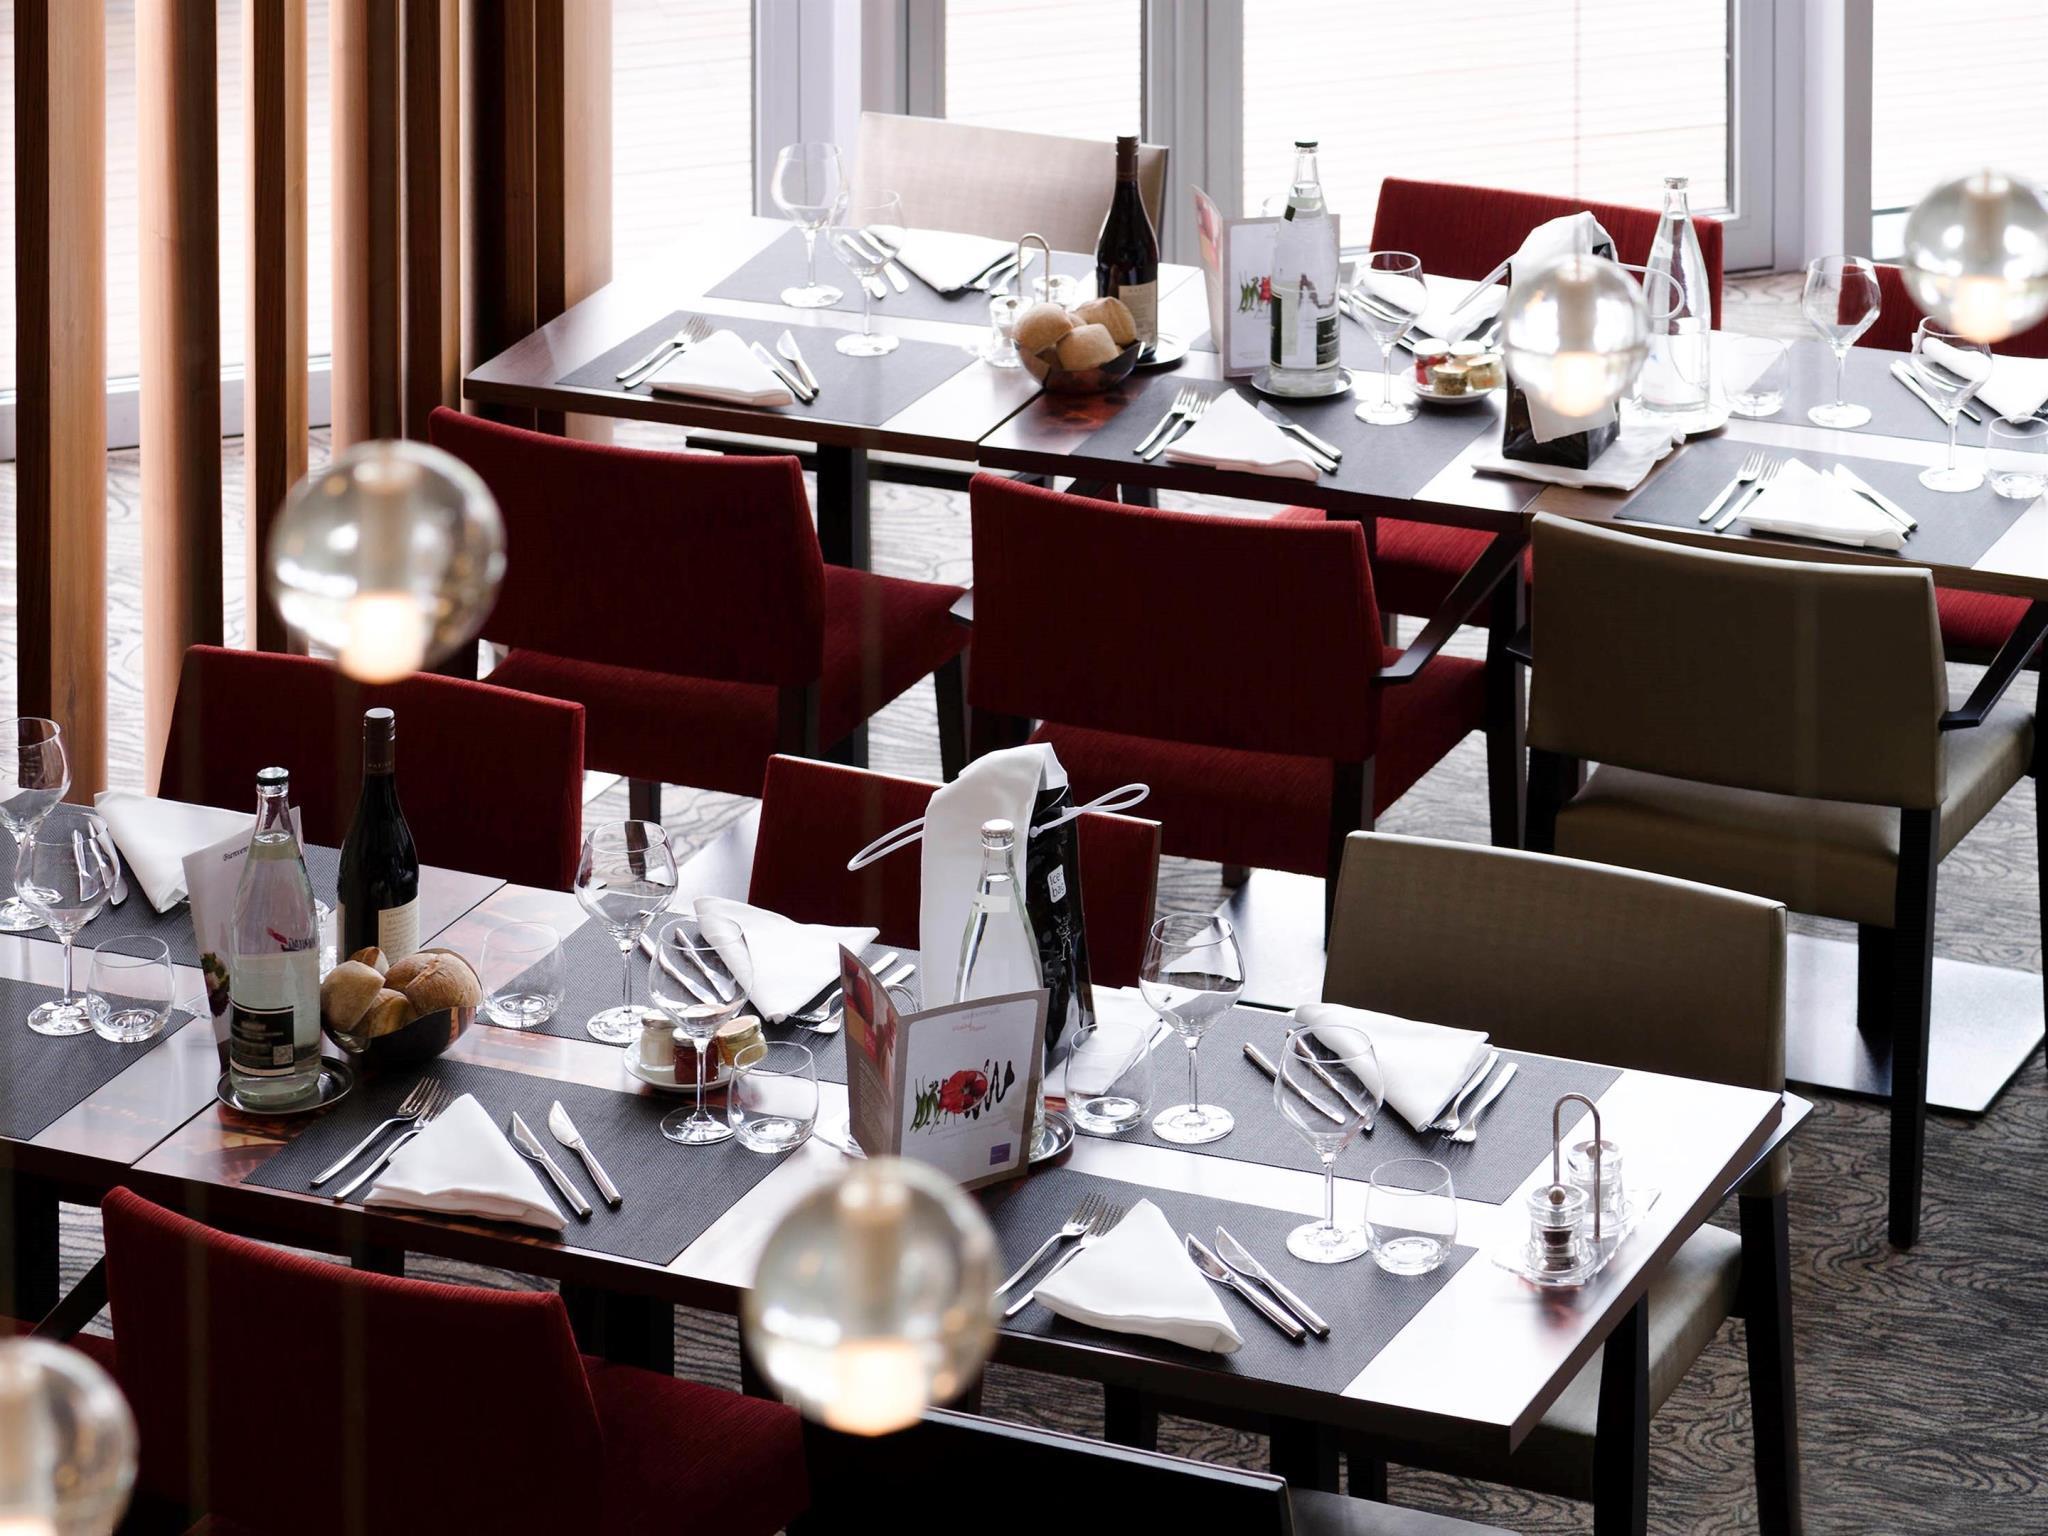 Novotel Lyon Confluence Hotel